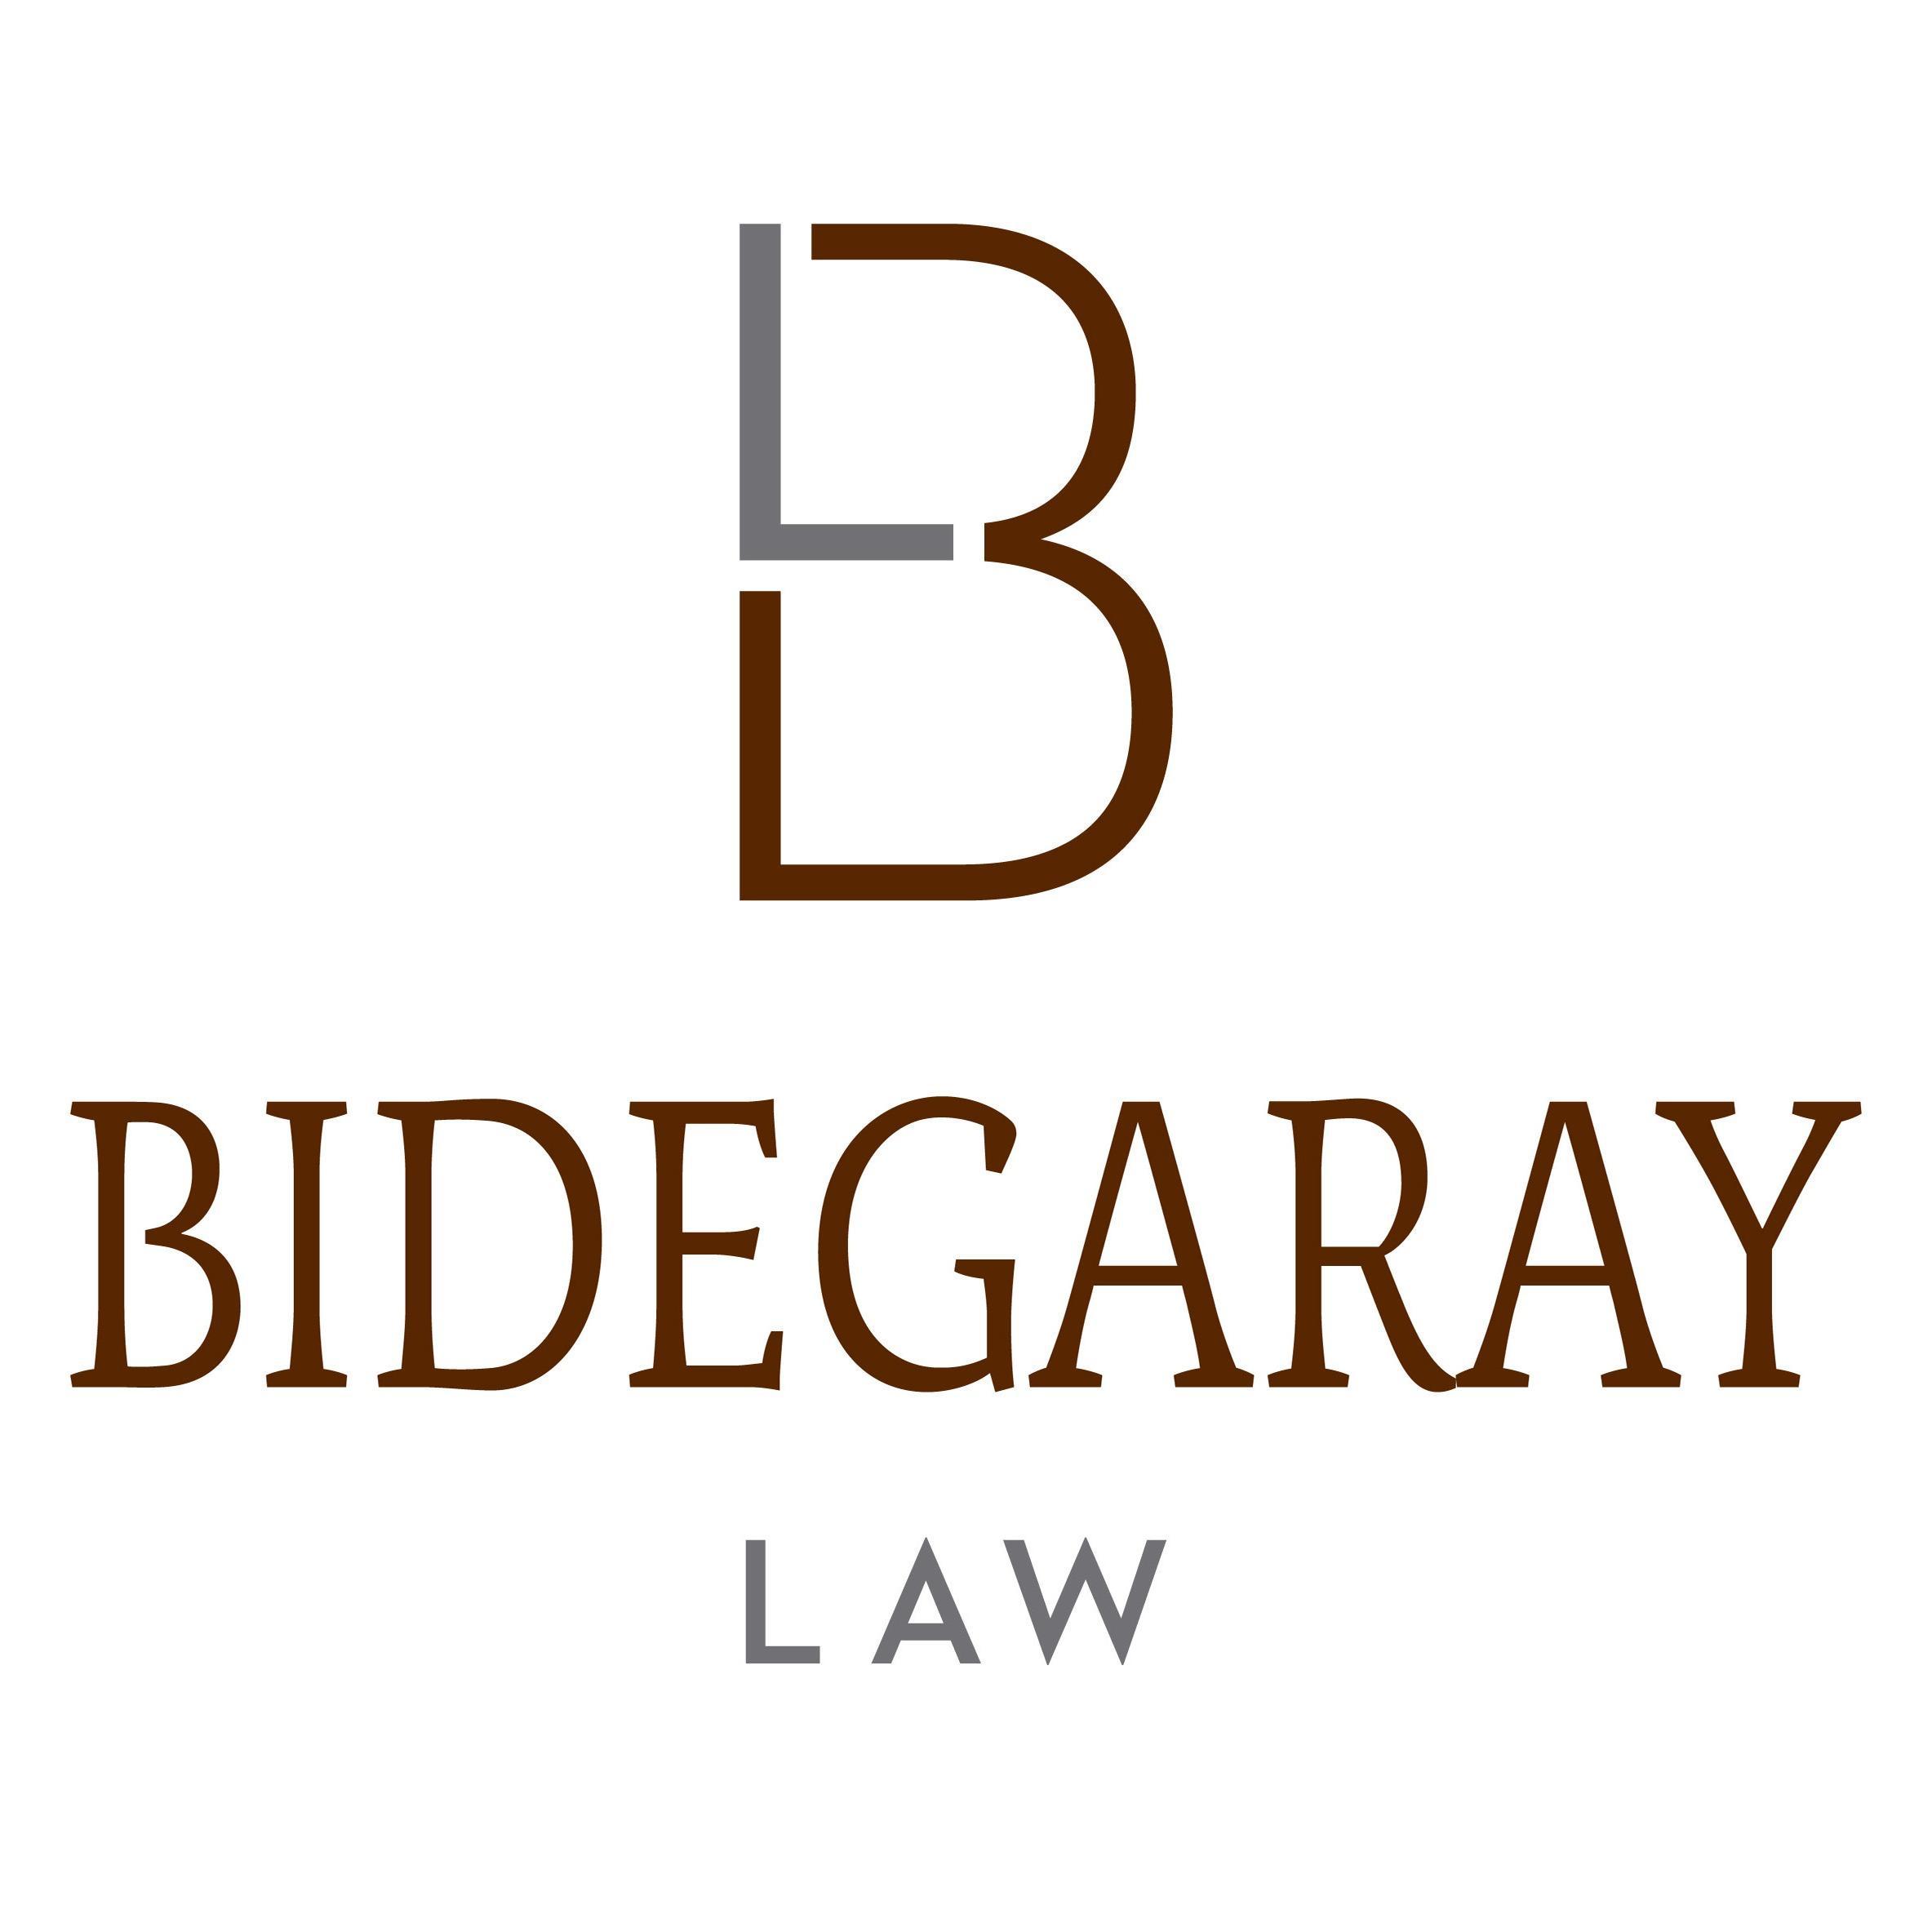 Bidegaray Law Firm, LLC